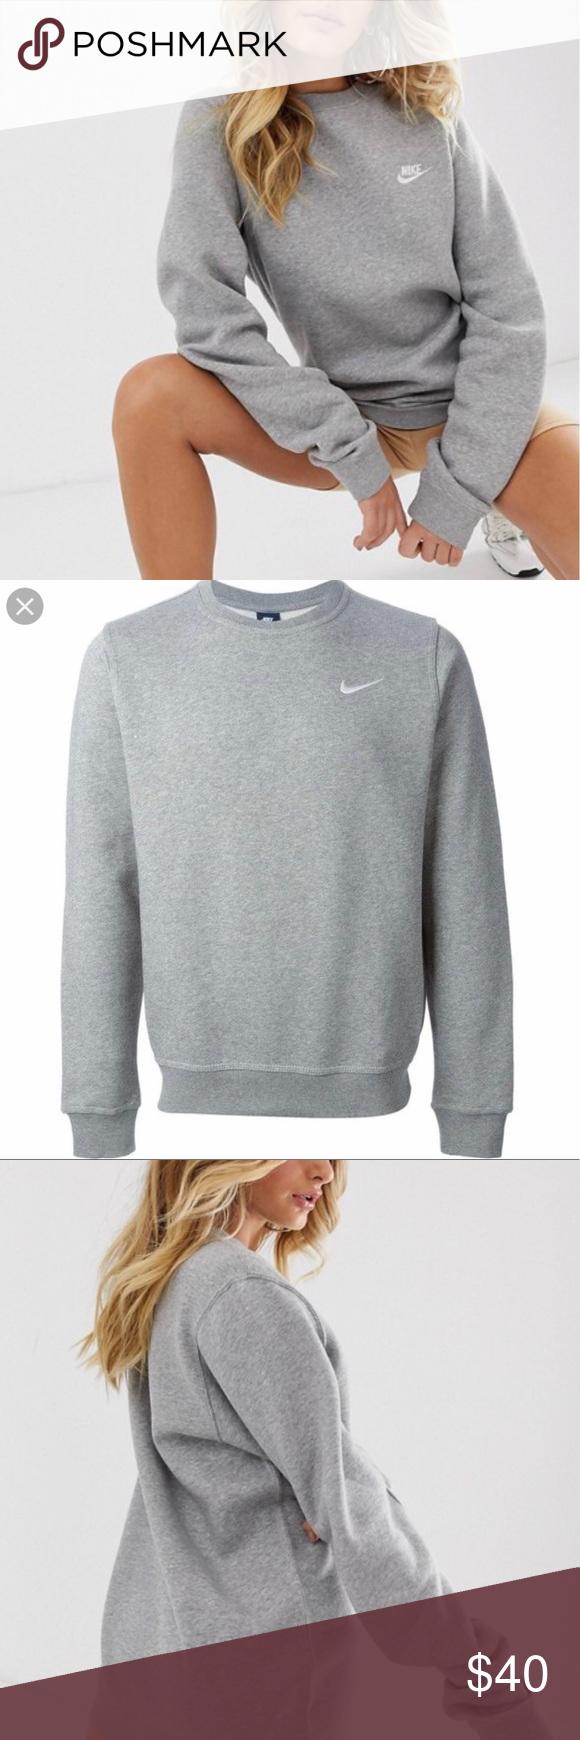 Nike Club Swoosh Crewneck Sweatshirt Sweatshirts Crew Neck Sweatshirt Clothes Design [ 1740 x 580 Pixel ]